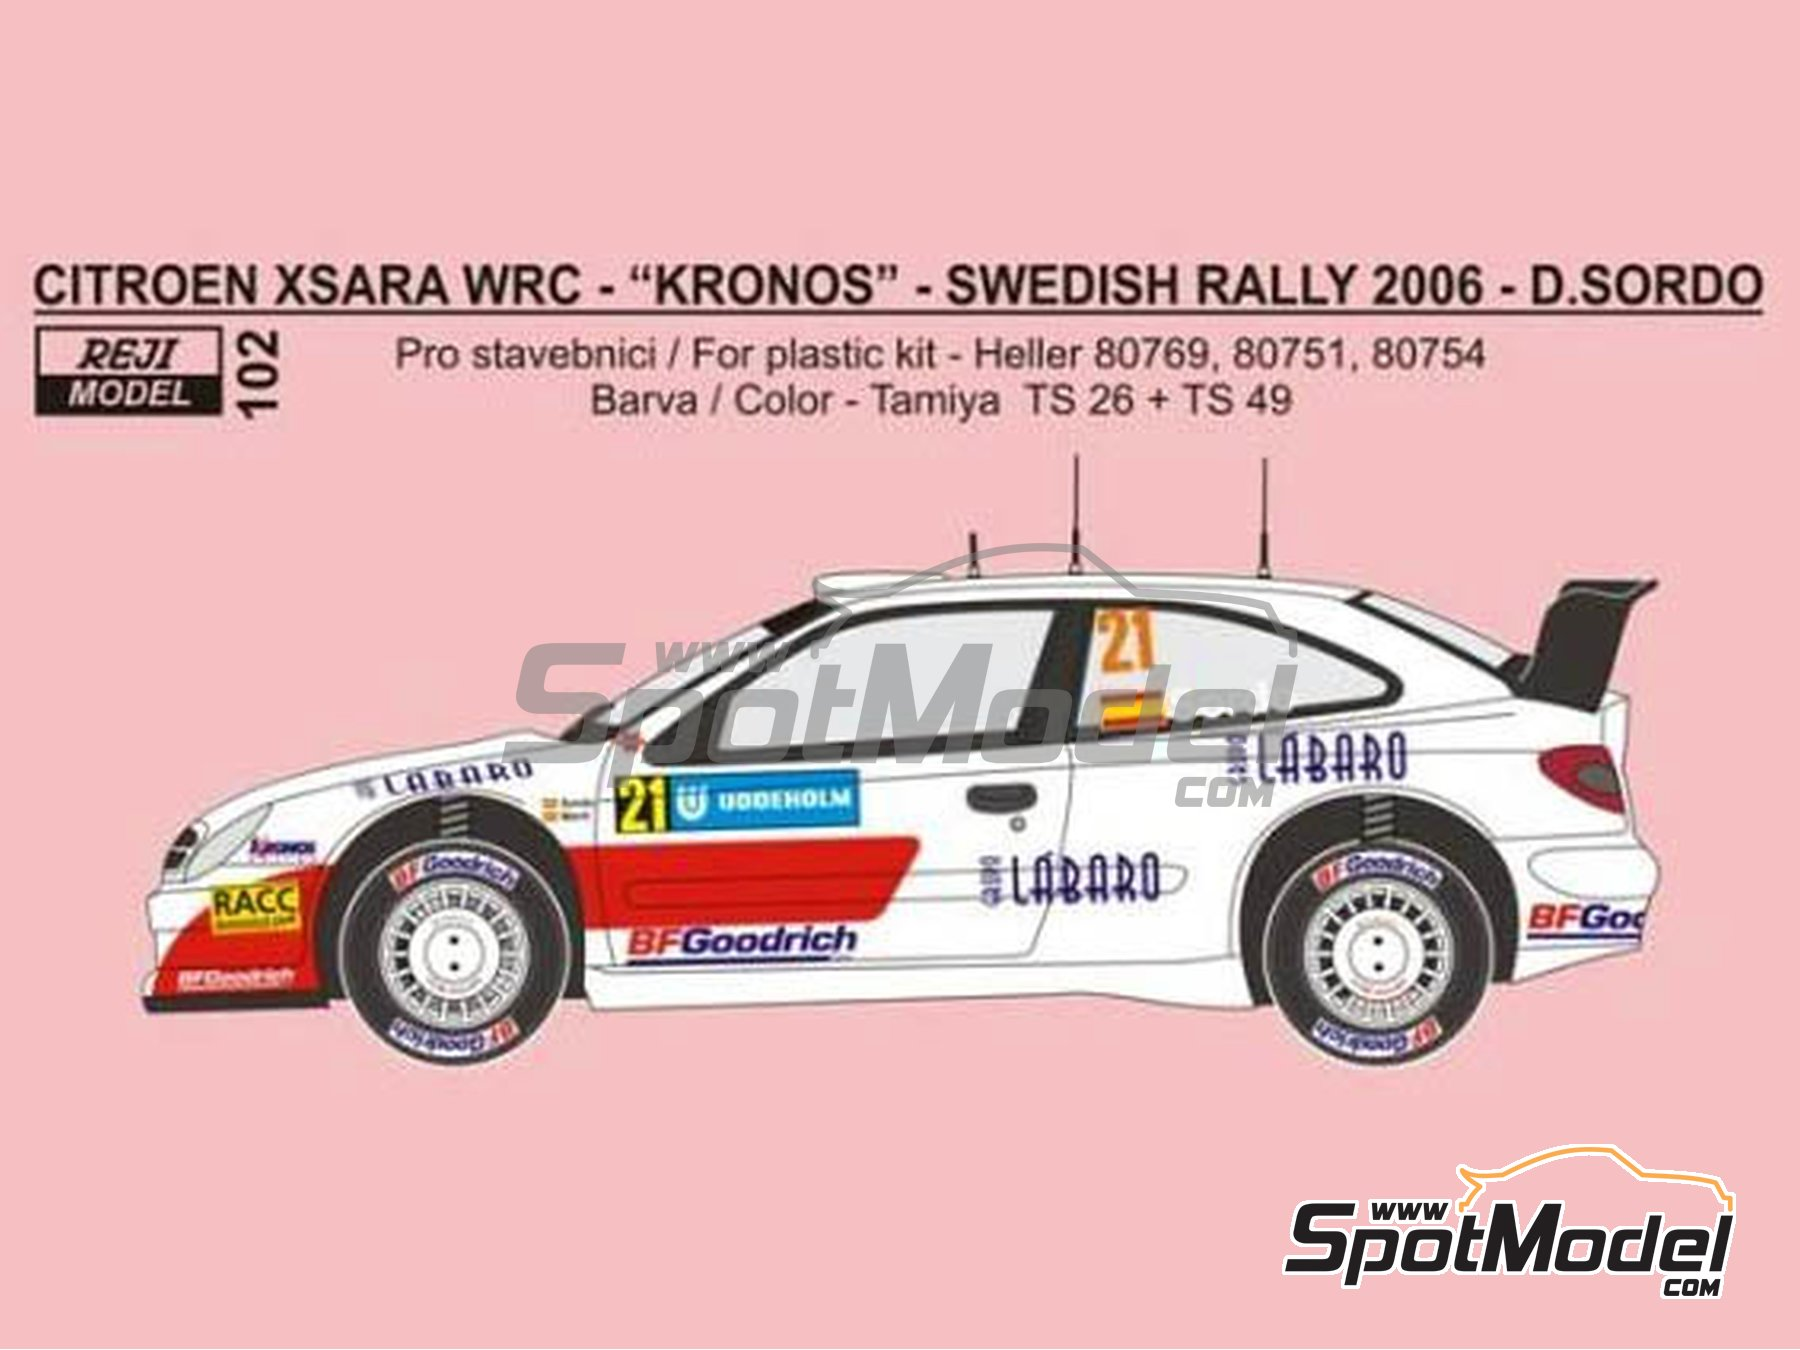 Image 2: Citroen Xsara WRC Kronos - Montecarlo Rally, Svezia Sweden Rally 2006 | Marking / livery in 1/24 scale manufactured by Reji Model (ref.REJI-102)